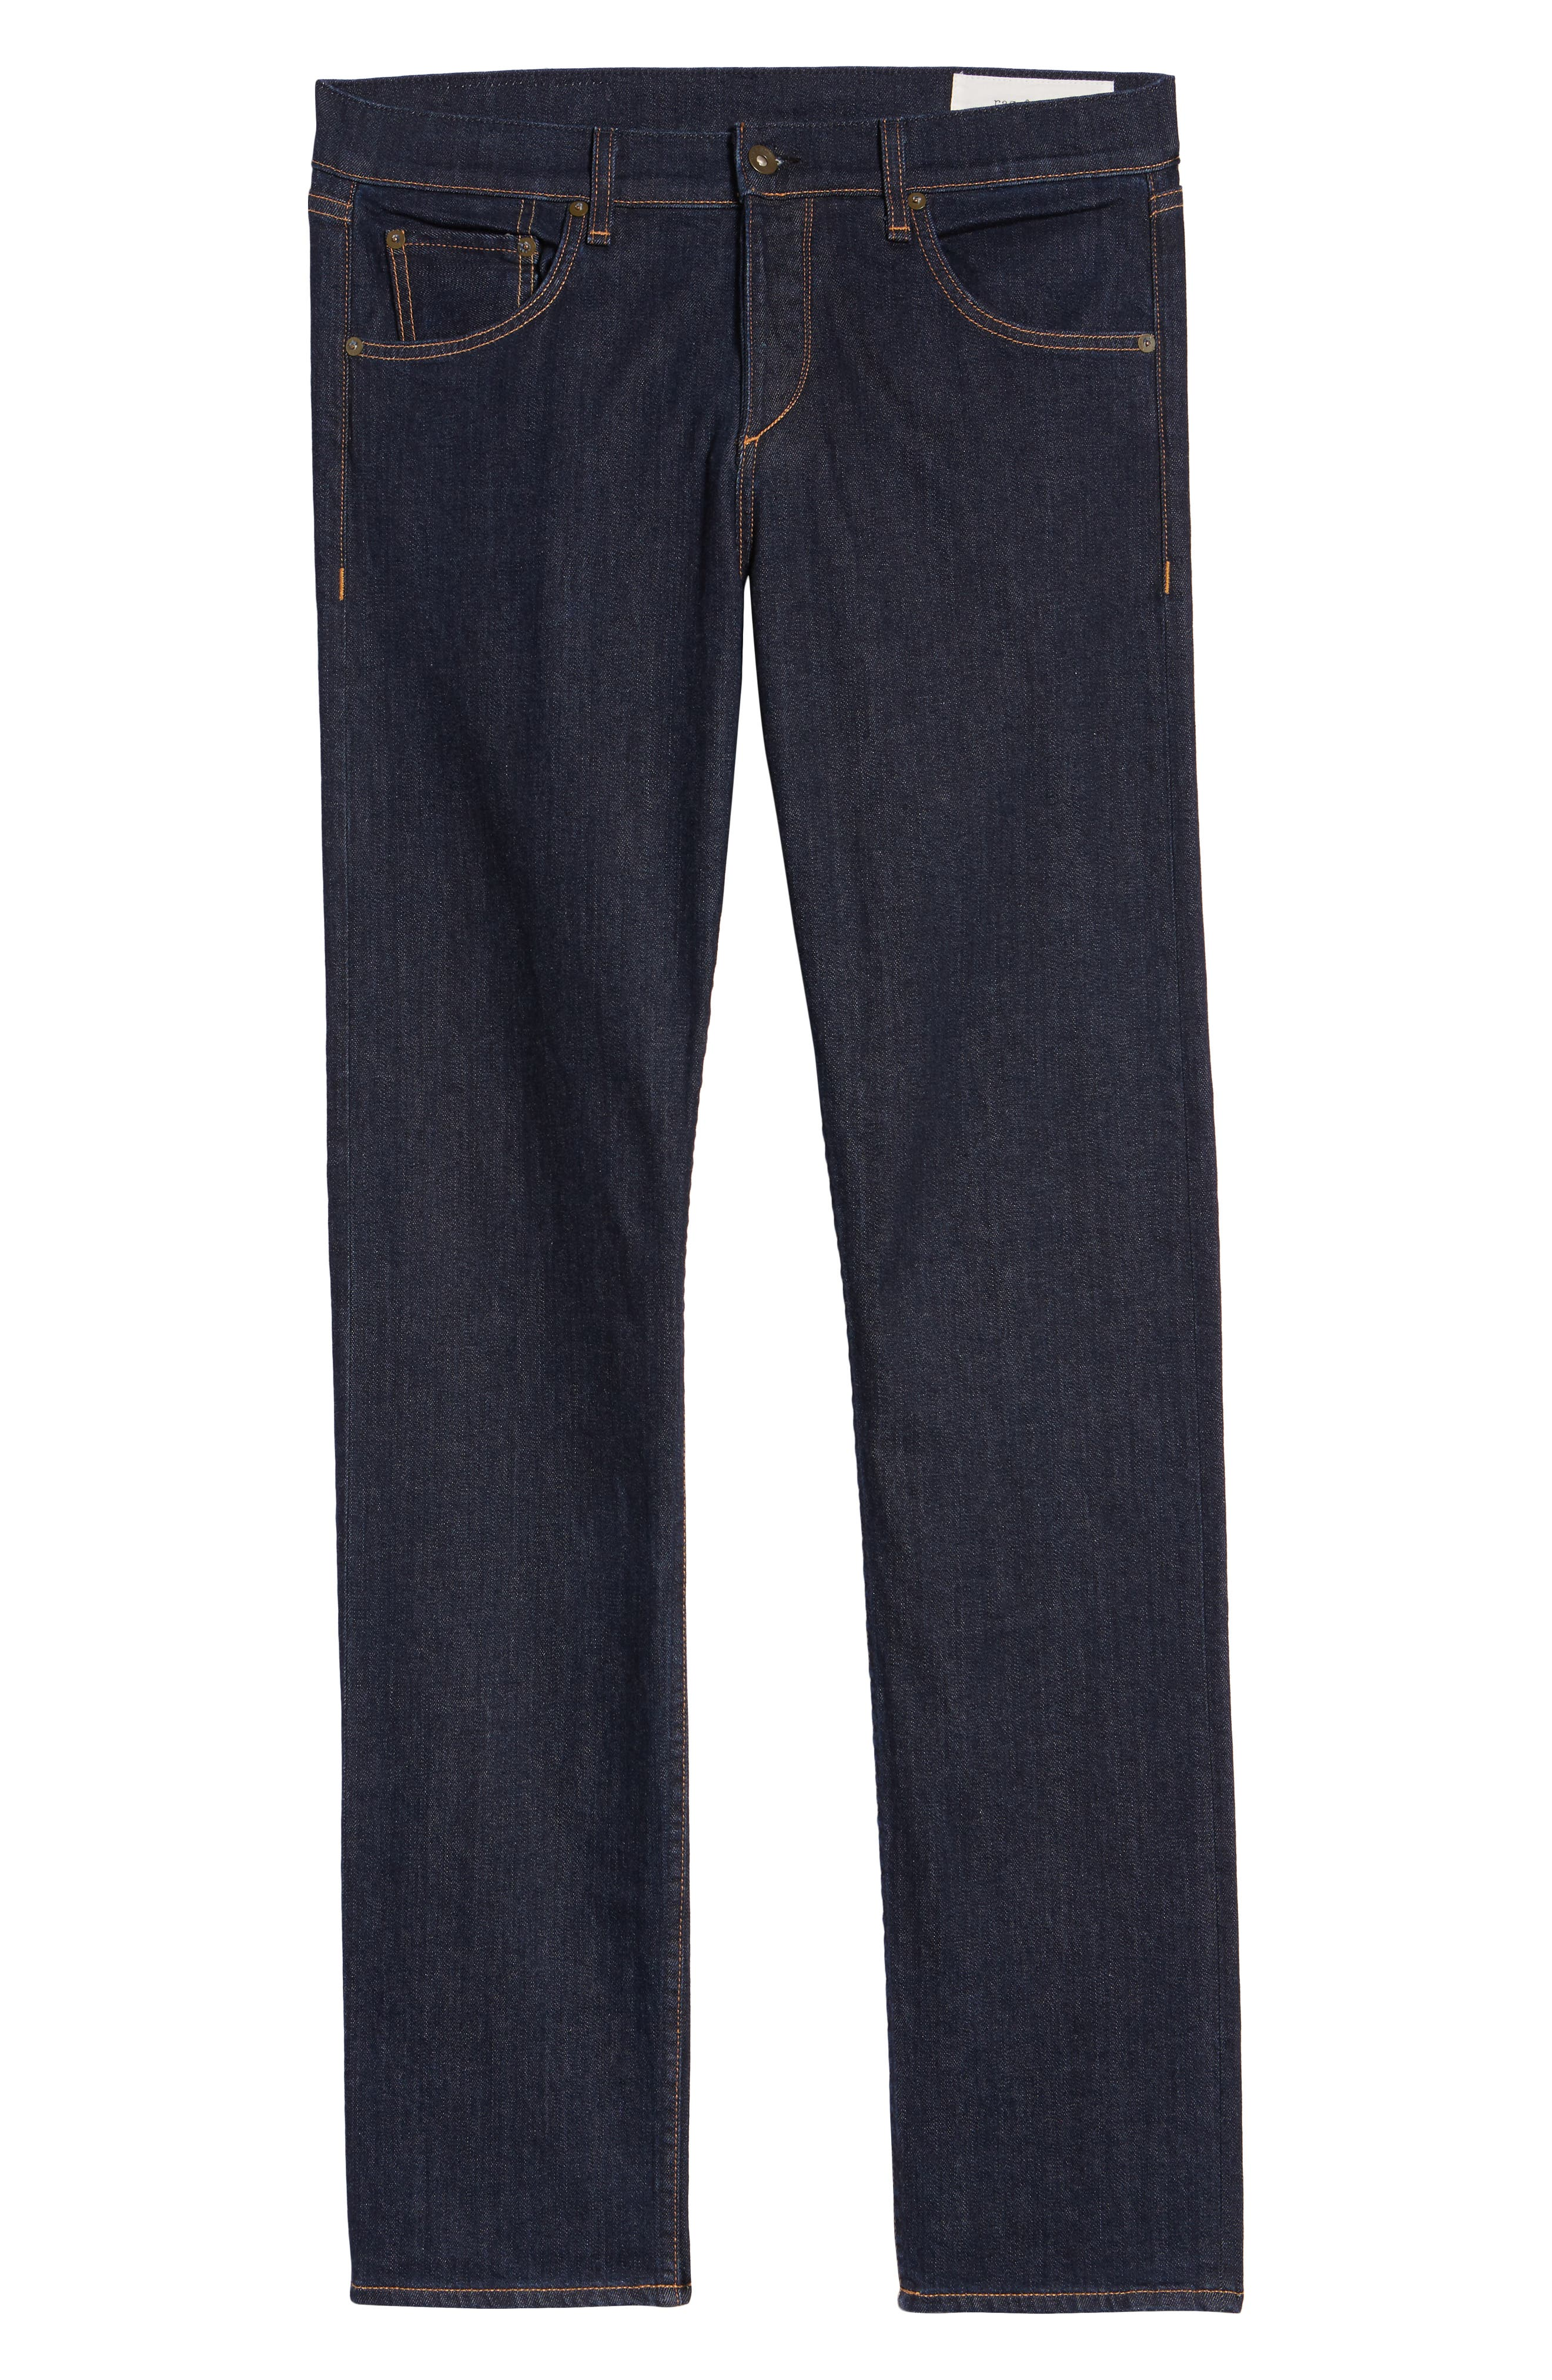 RAG & BONE, Standard Issue Fit 3 Slim Straight Leg Jeans, Alternate thumbnail 7, color, HERITAGE